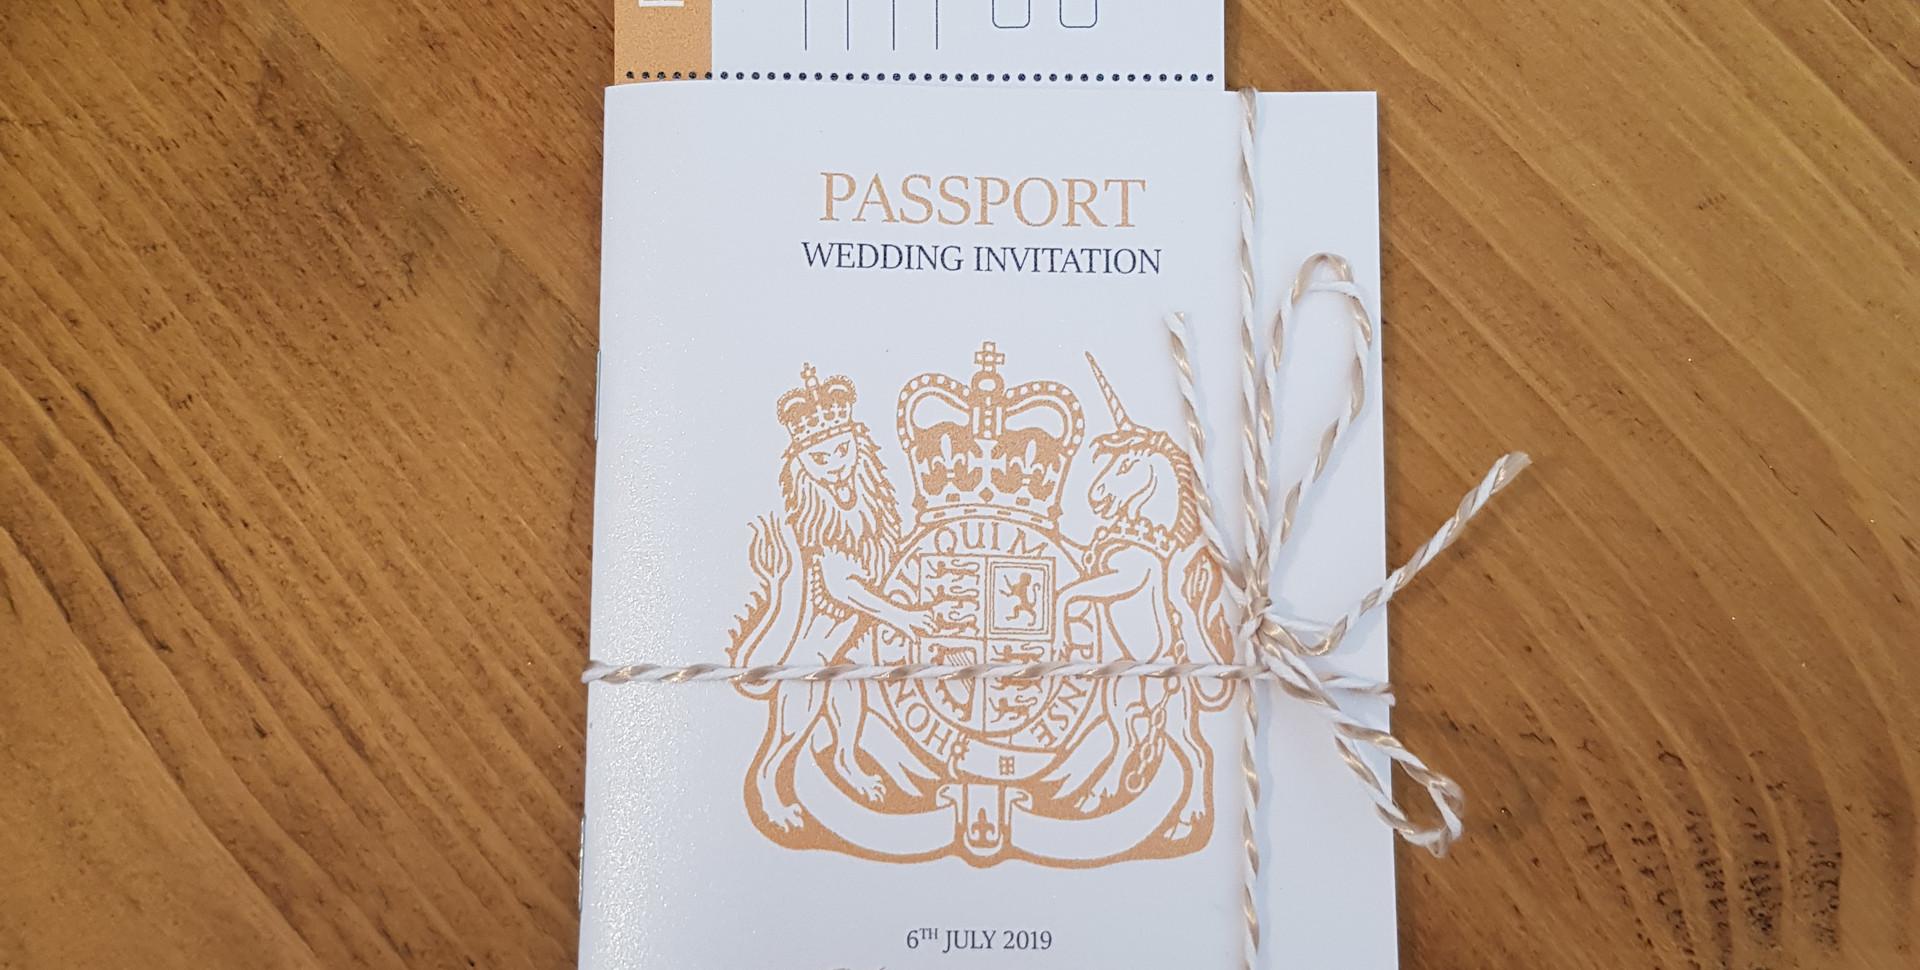 Heather - Passport and boarding pass invitation